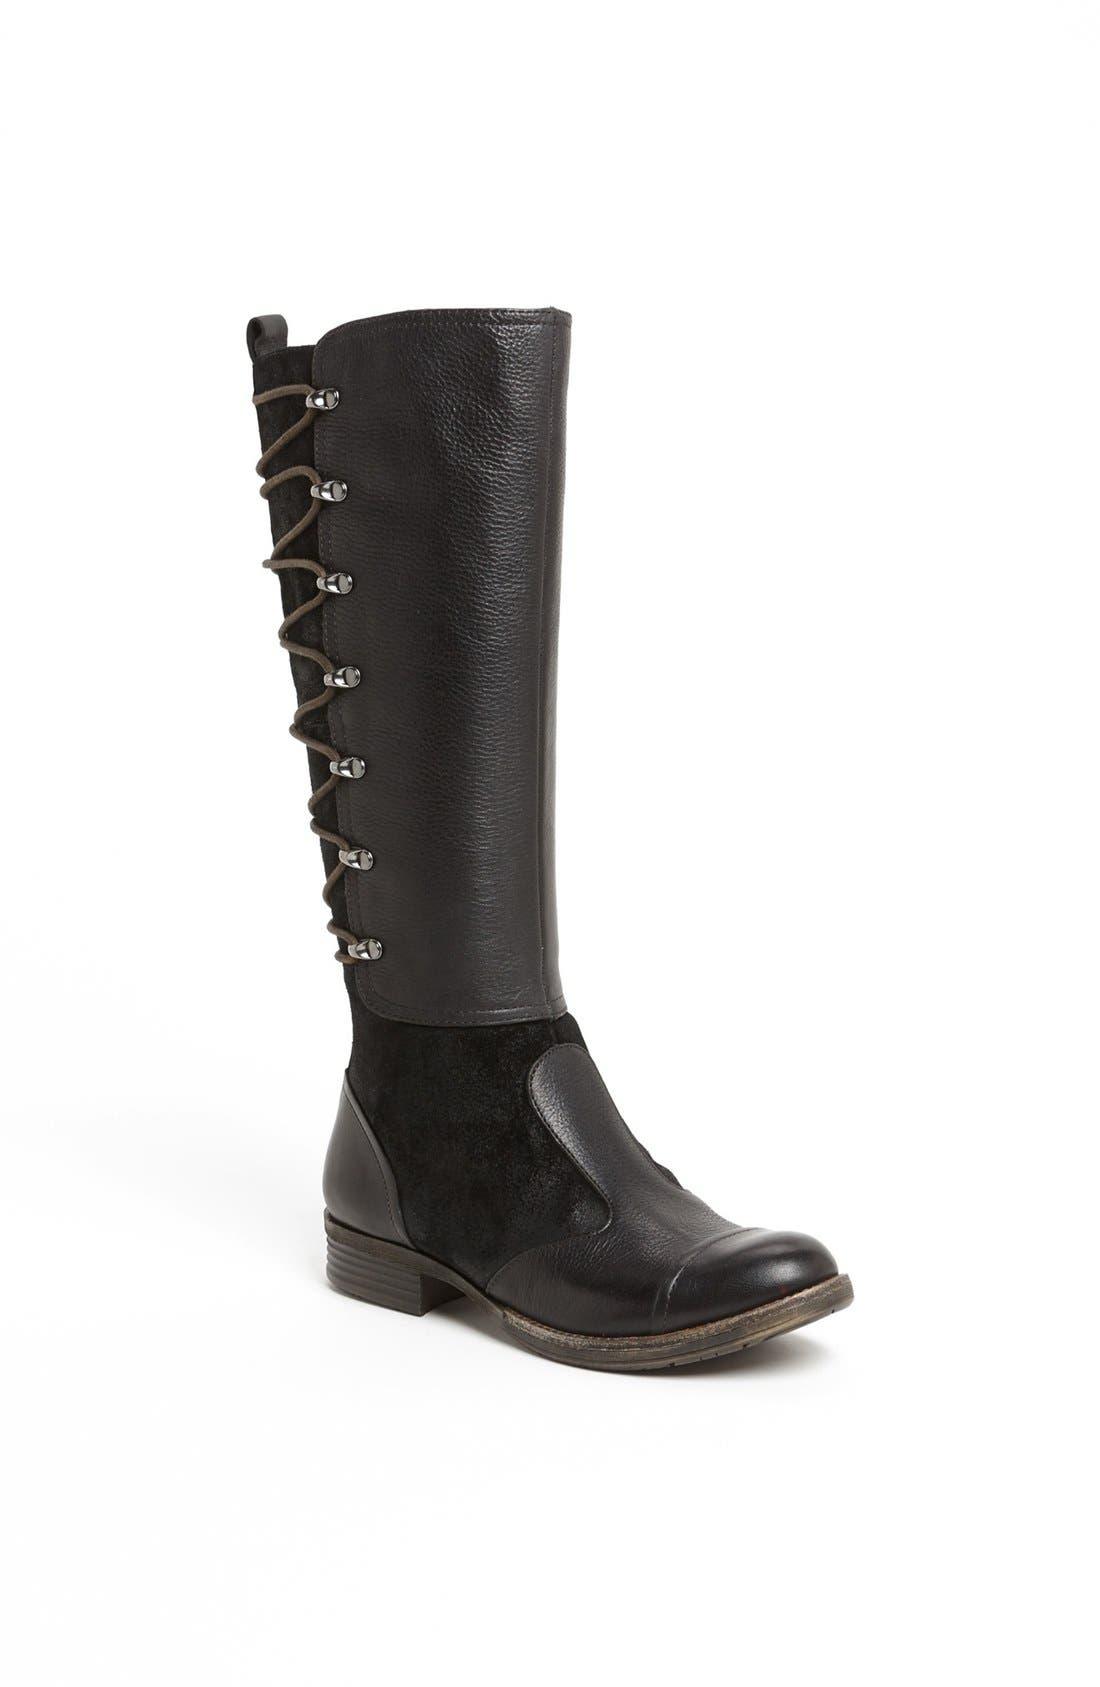 Alternate Image 1 Selected - Naya 'Apollonia' Boot